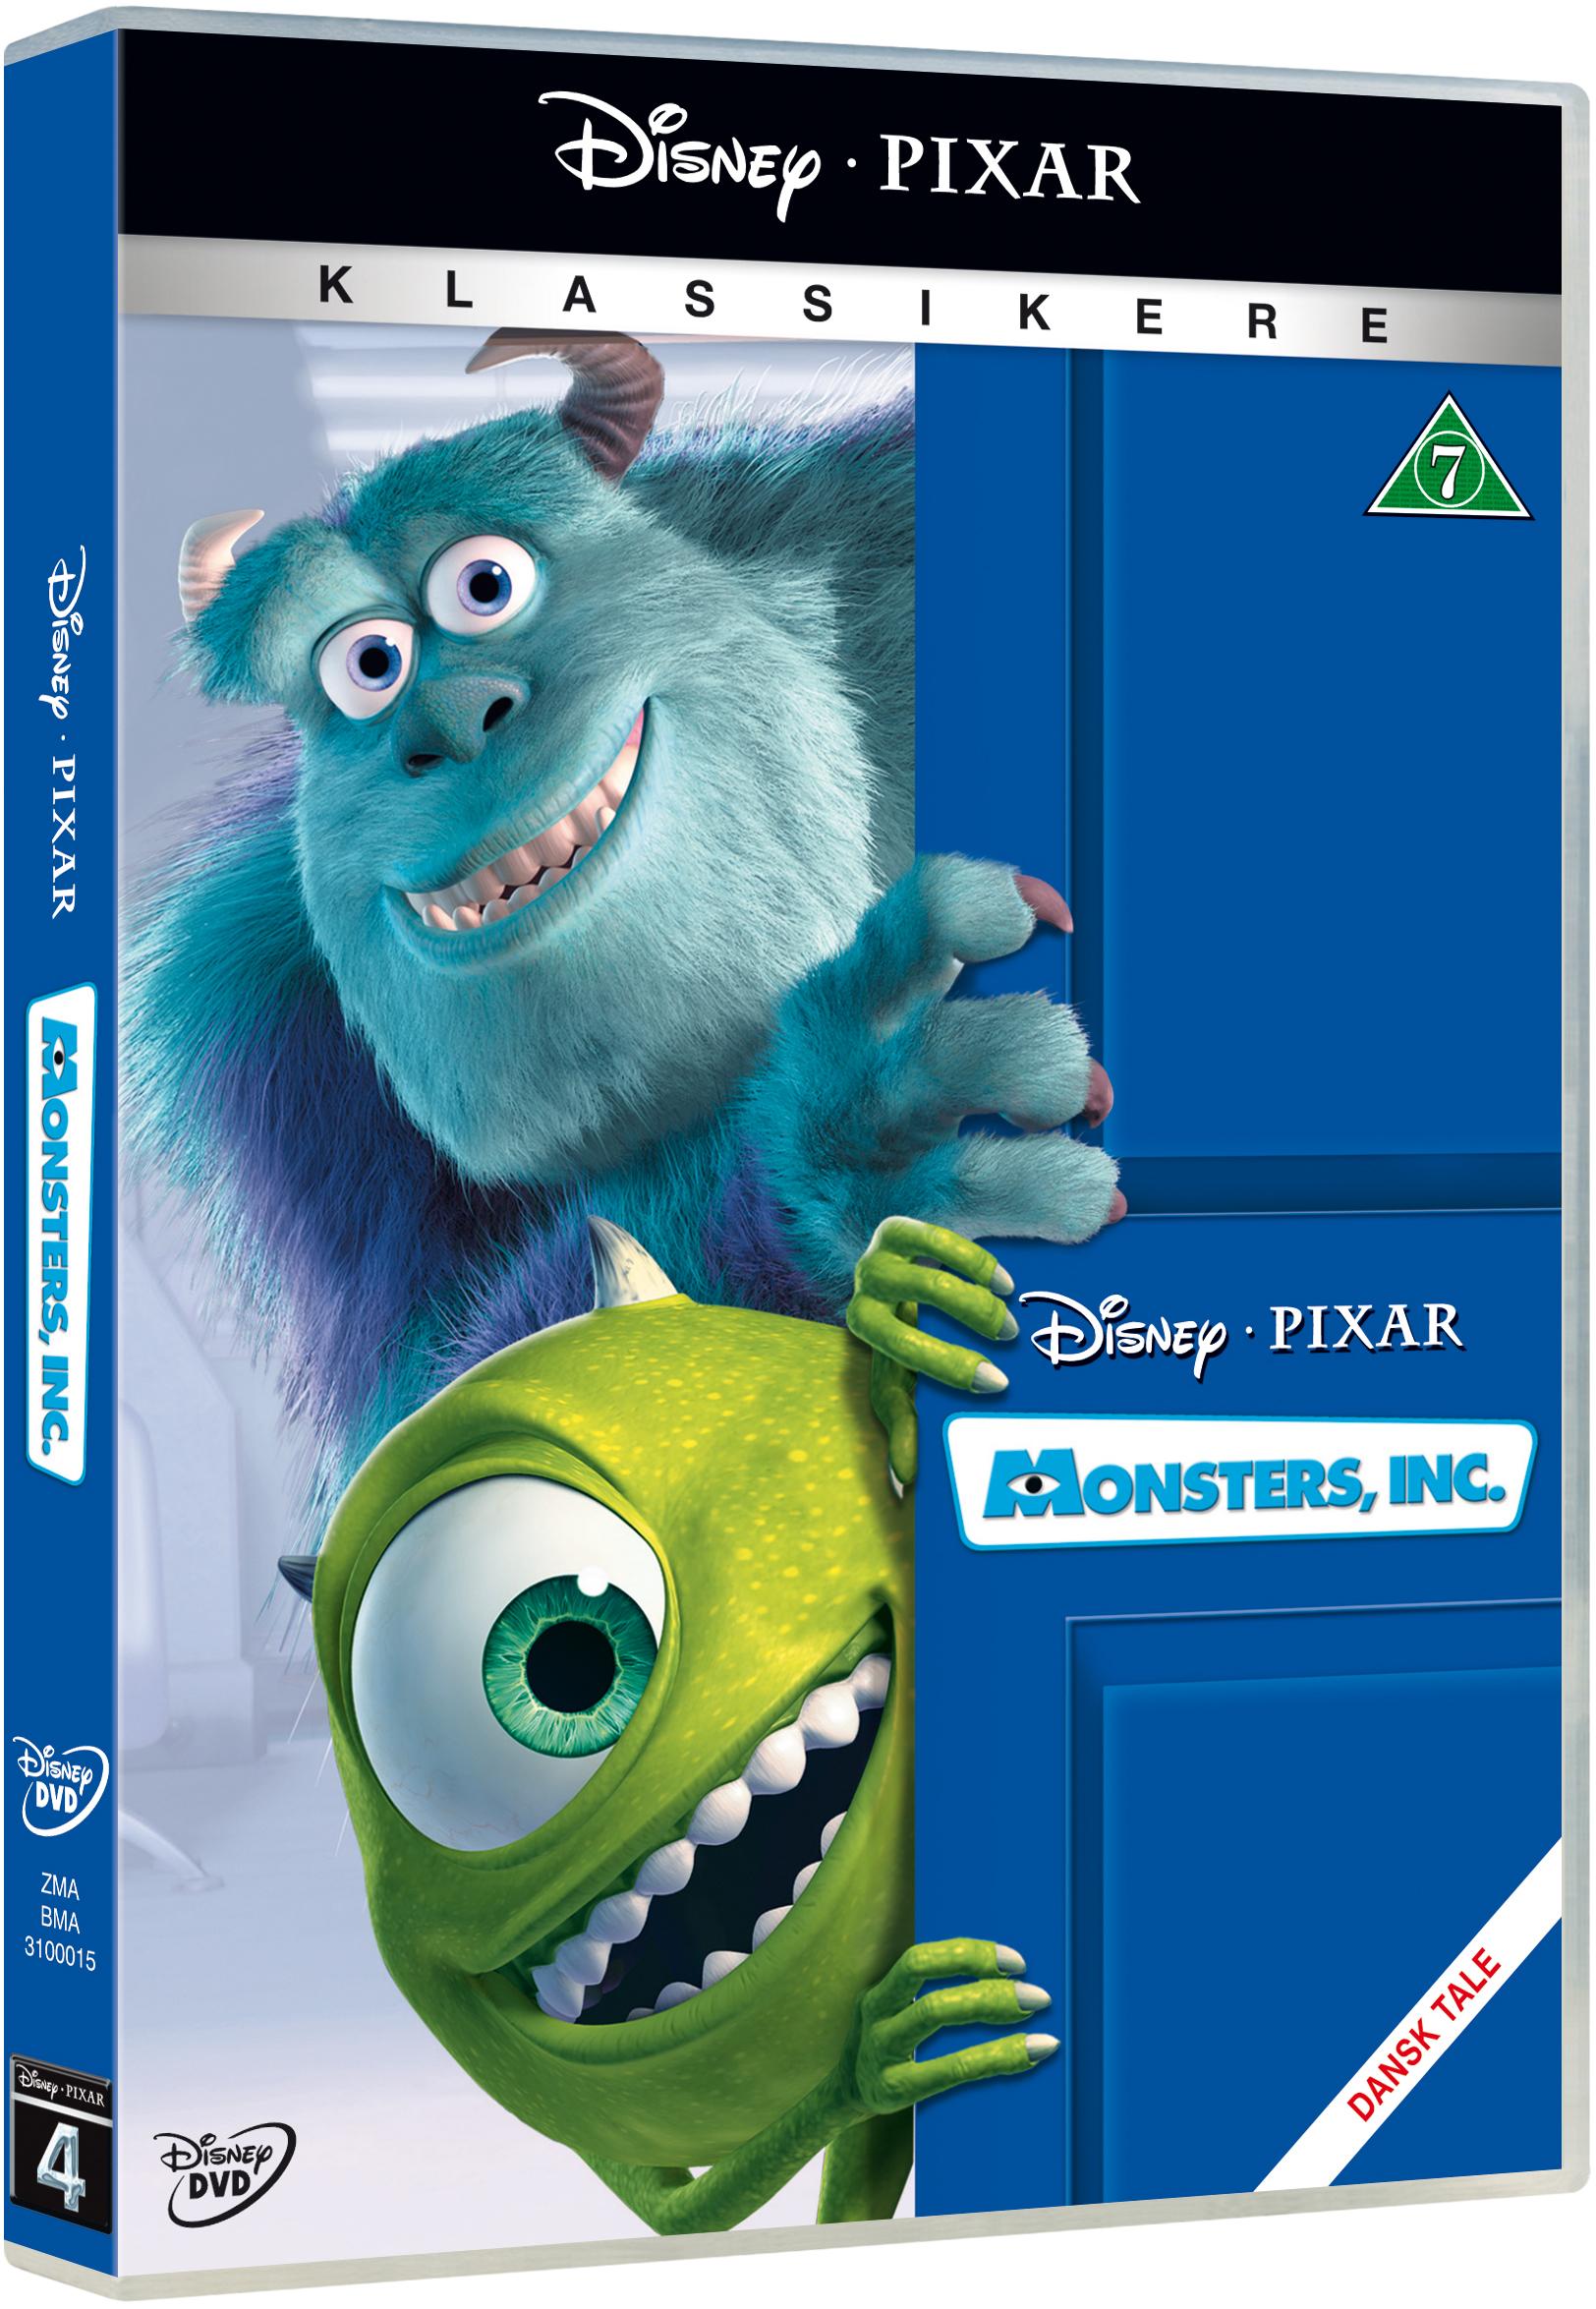 Monsters, Inc. Pixar #4